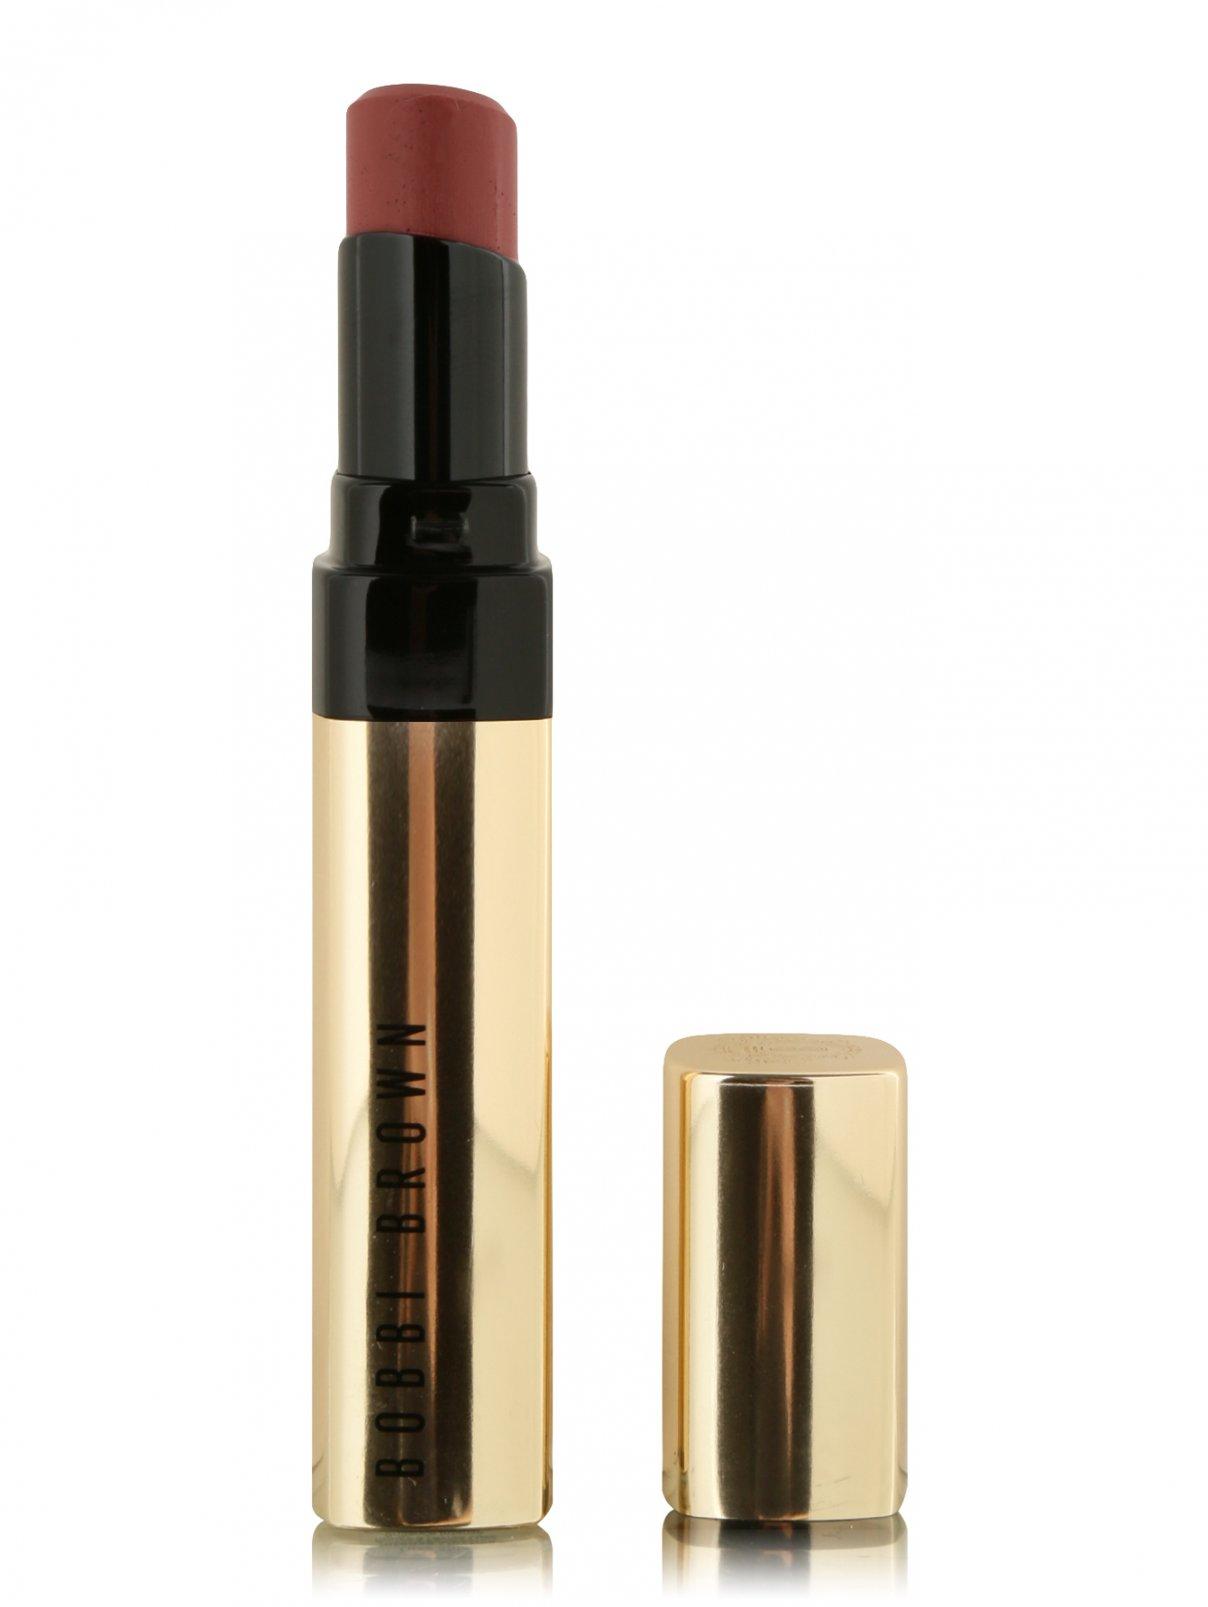 Помада Luxe Shine оттенок - Intense Claret Makeup Bobbi Brown  –  Общий вид